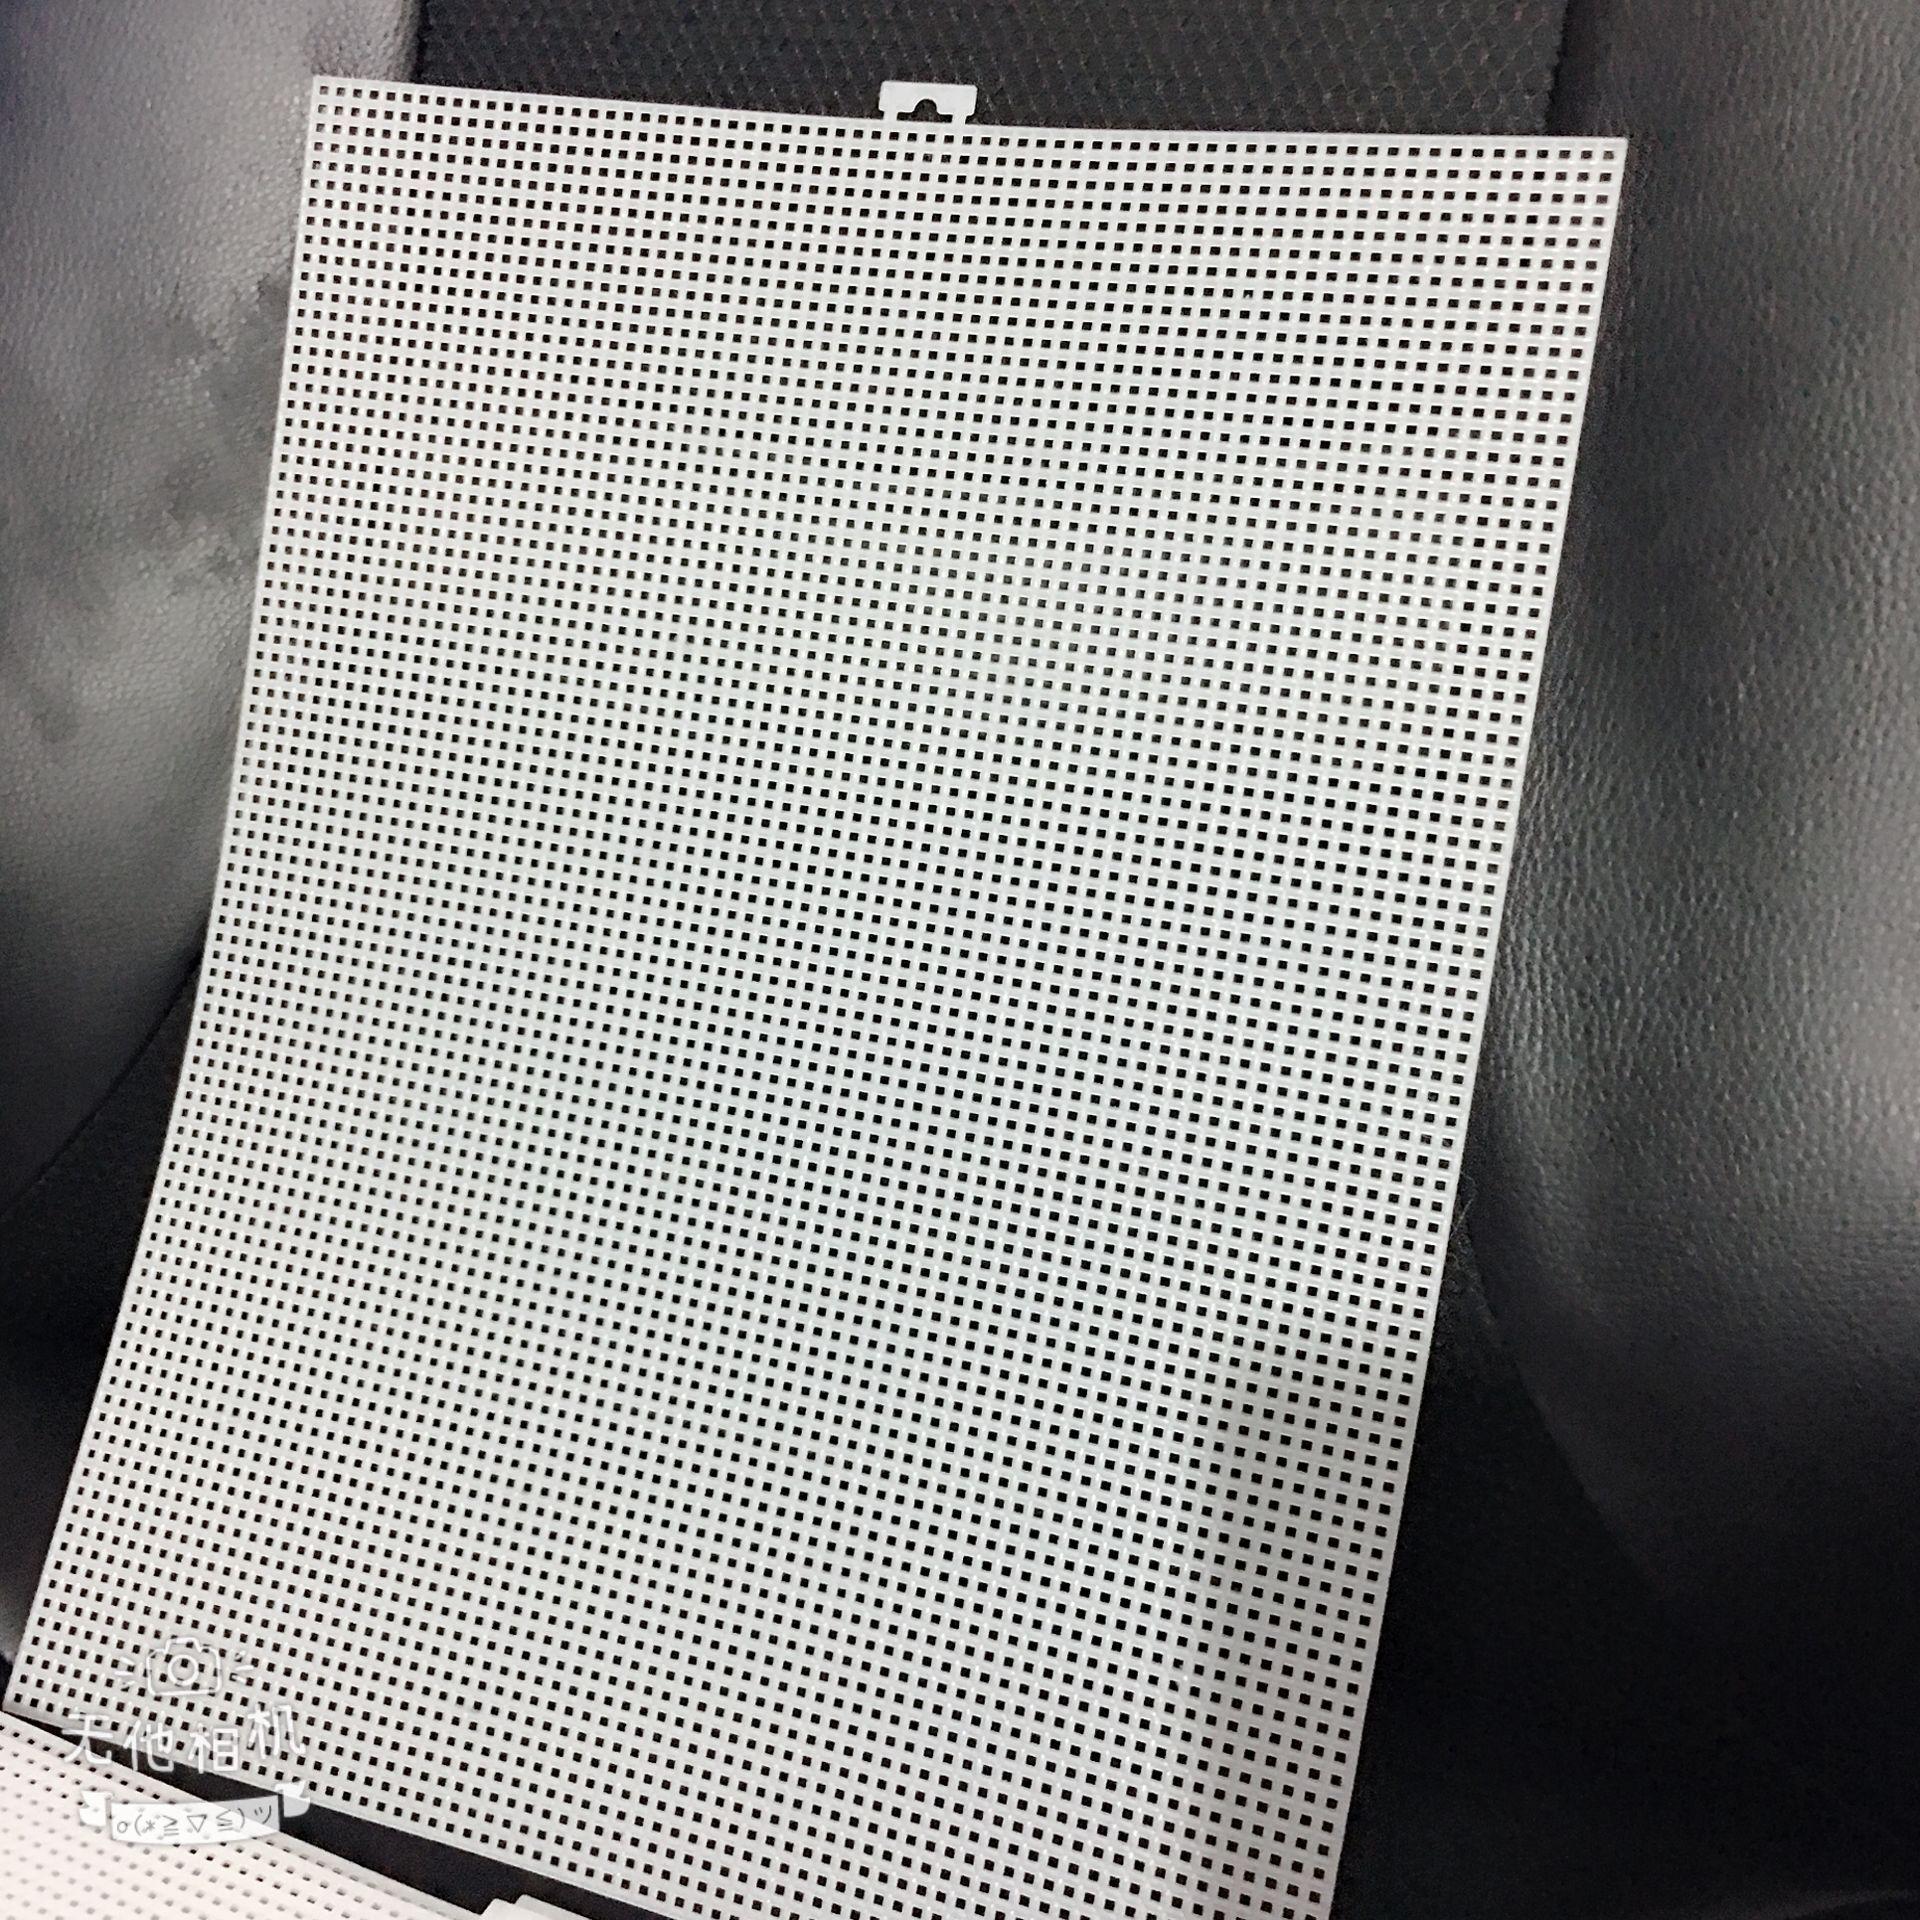 Clear Plastic Canvas Fabric Cross Stitch Kit Set Tissue Box 3D Cartoon Cross Stitching Embroidery 7ct26x33.5cm